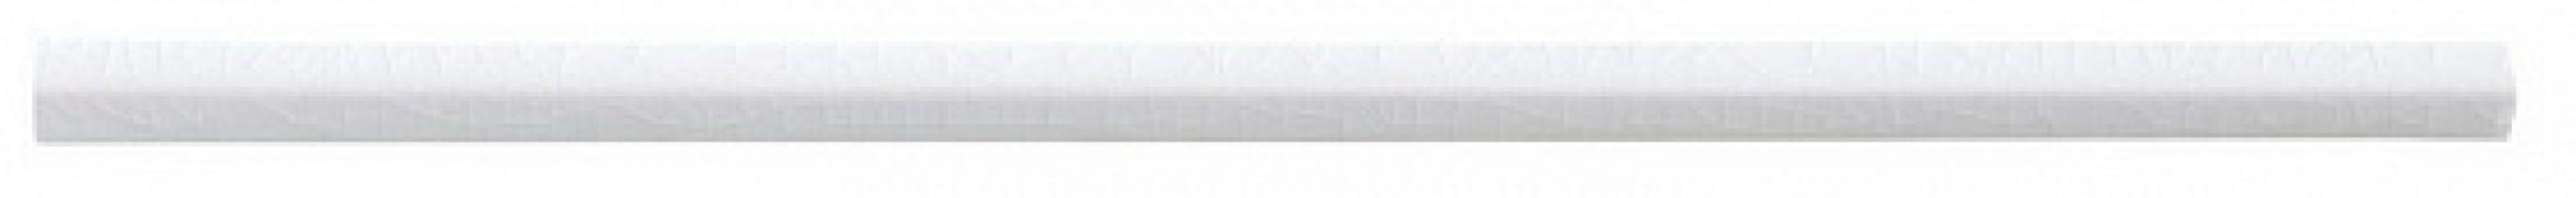 Бордюр Modernista ADMO5423 Bullnose Trim C/C Marfil 0.85x20 Adex